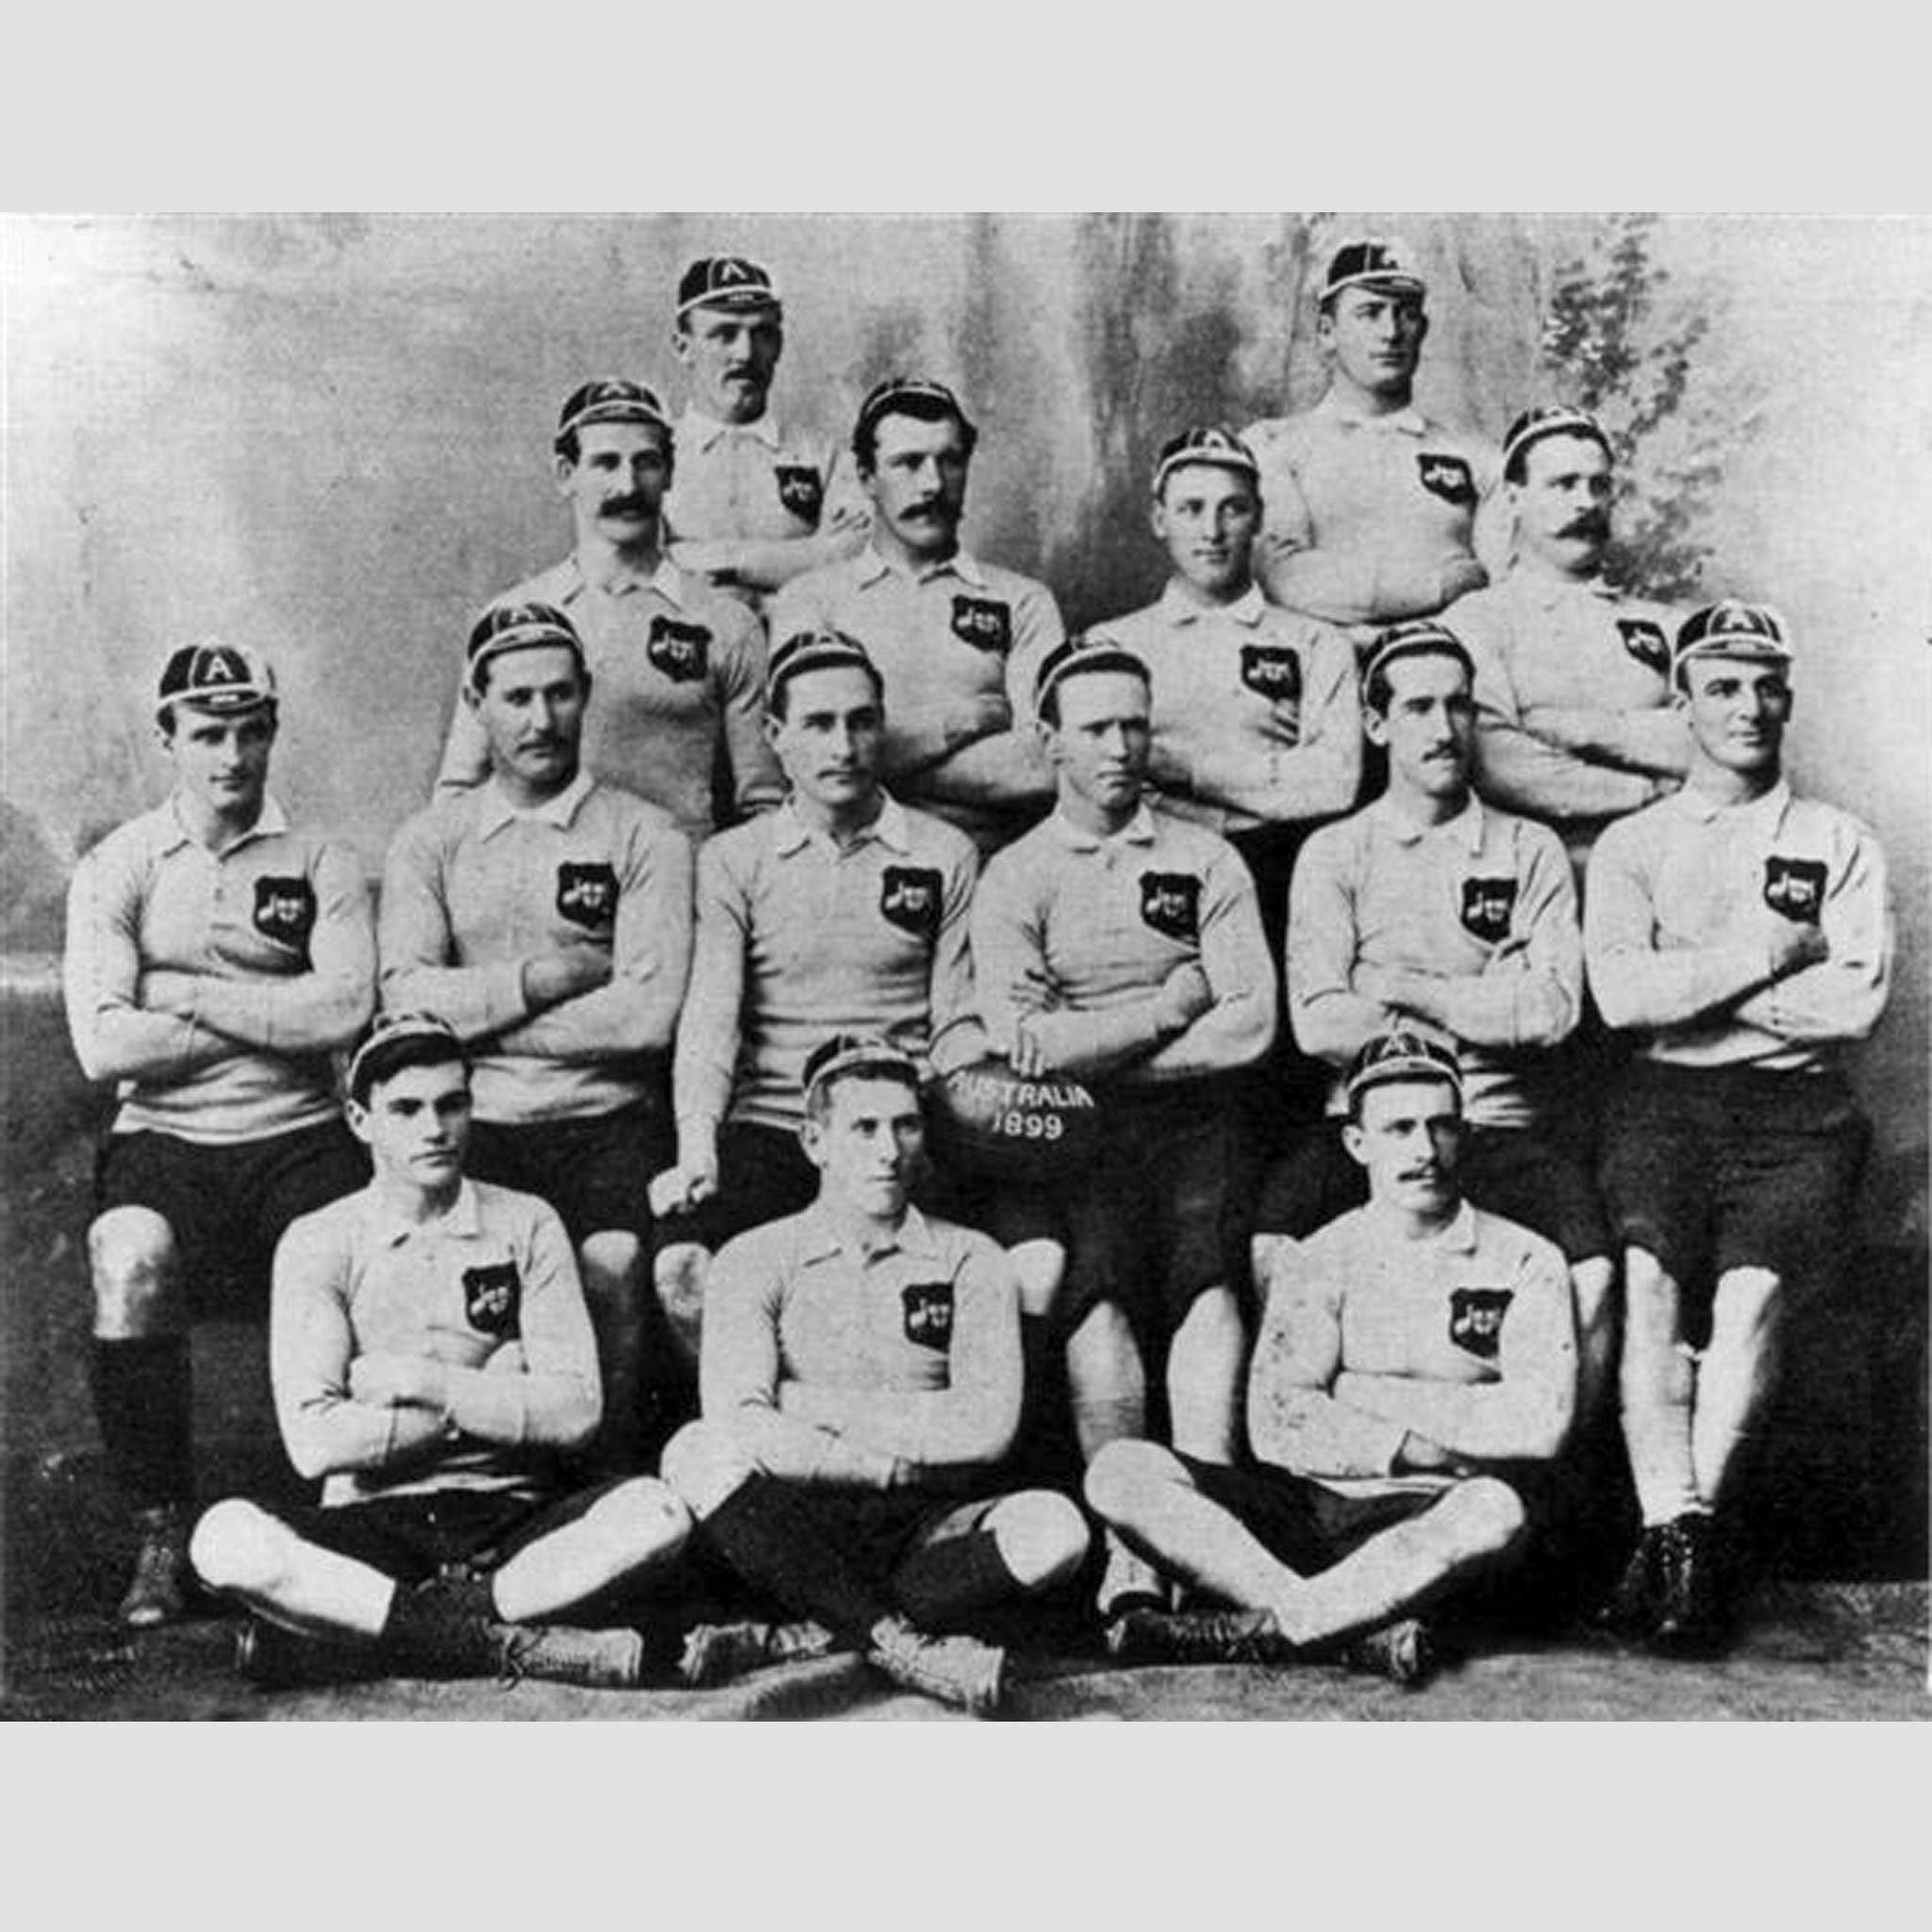 Australia 1899 Crest_Team_Photo